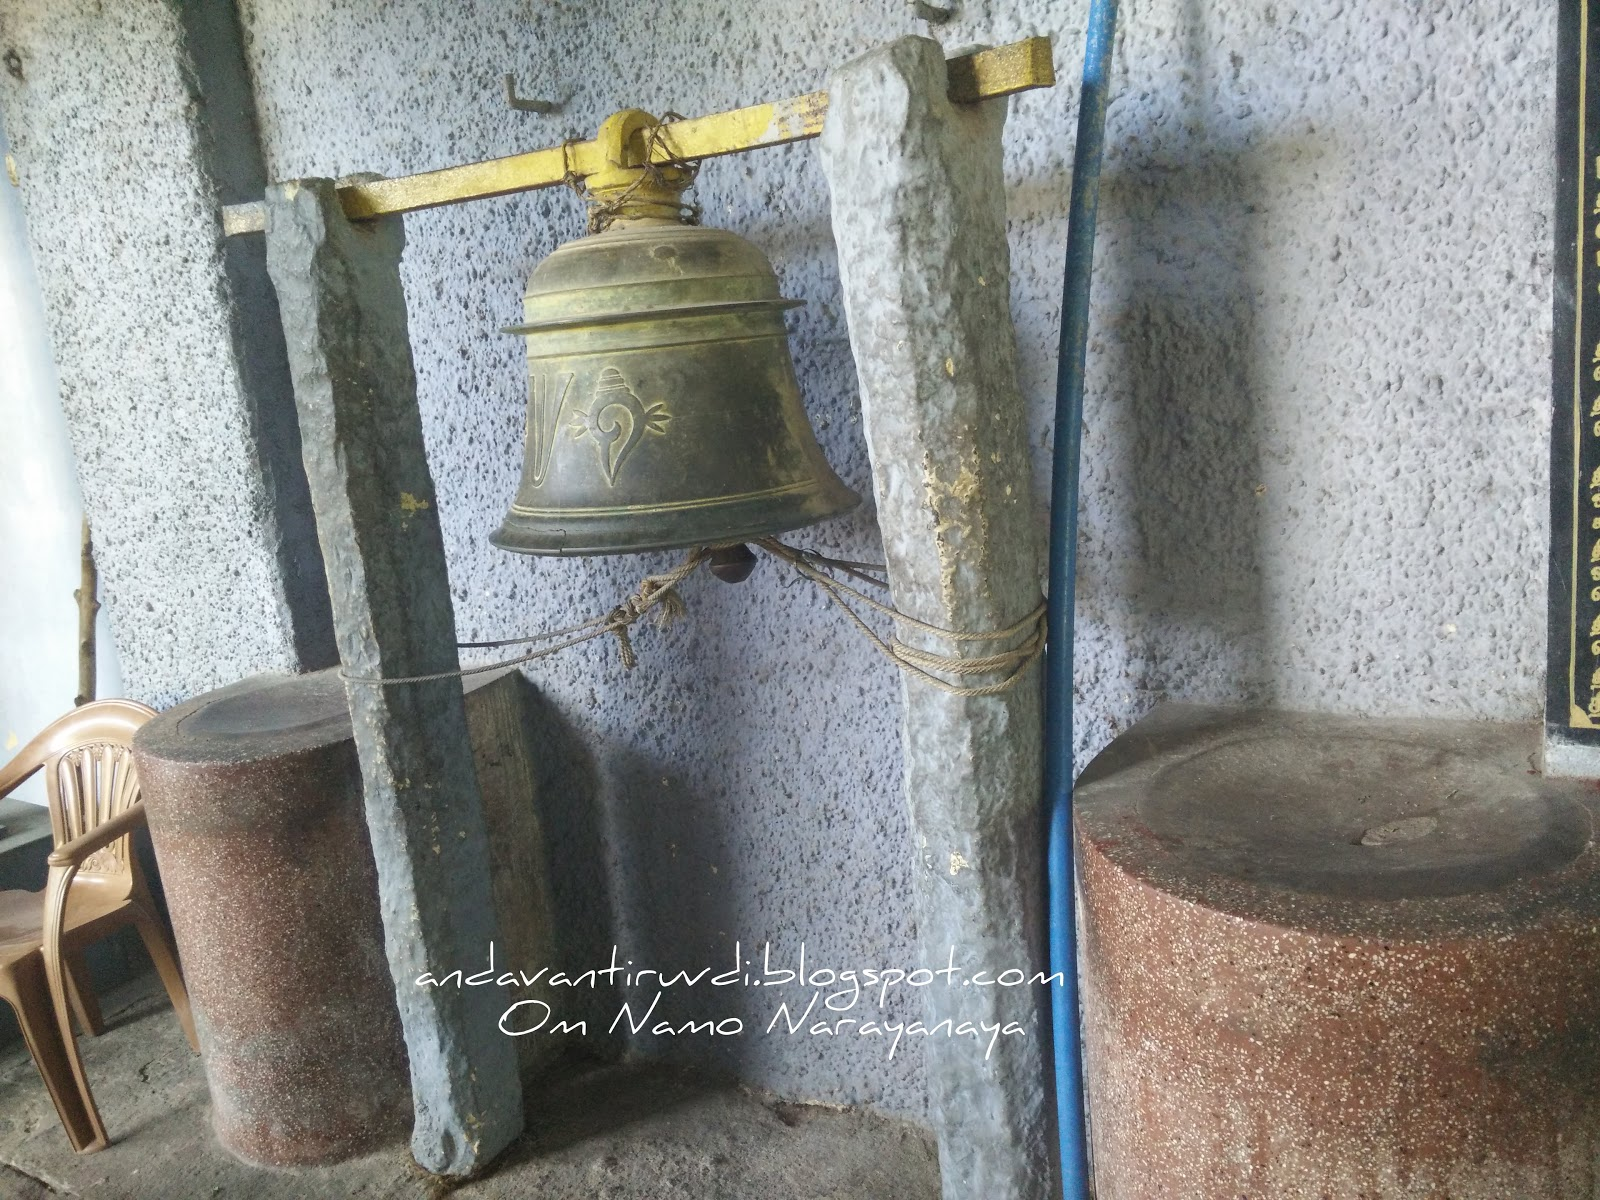 TEMPLE VISITS, கண்ணுக்கினியன கண்டோம்,